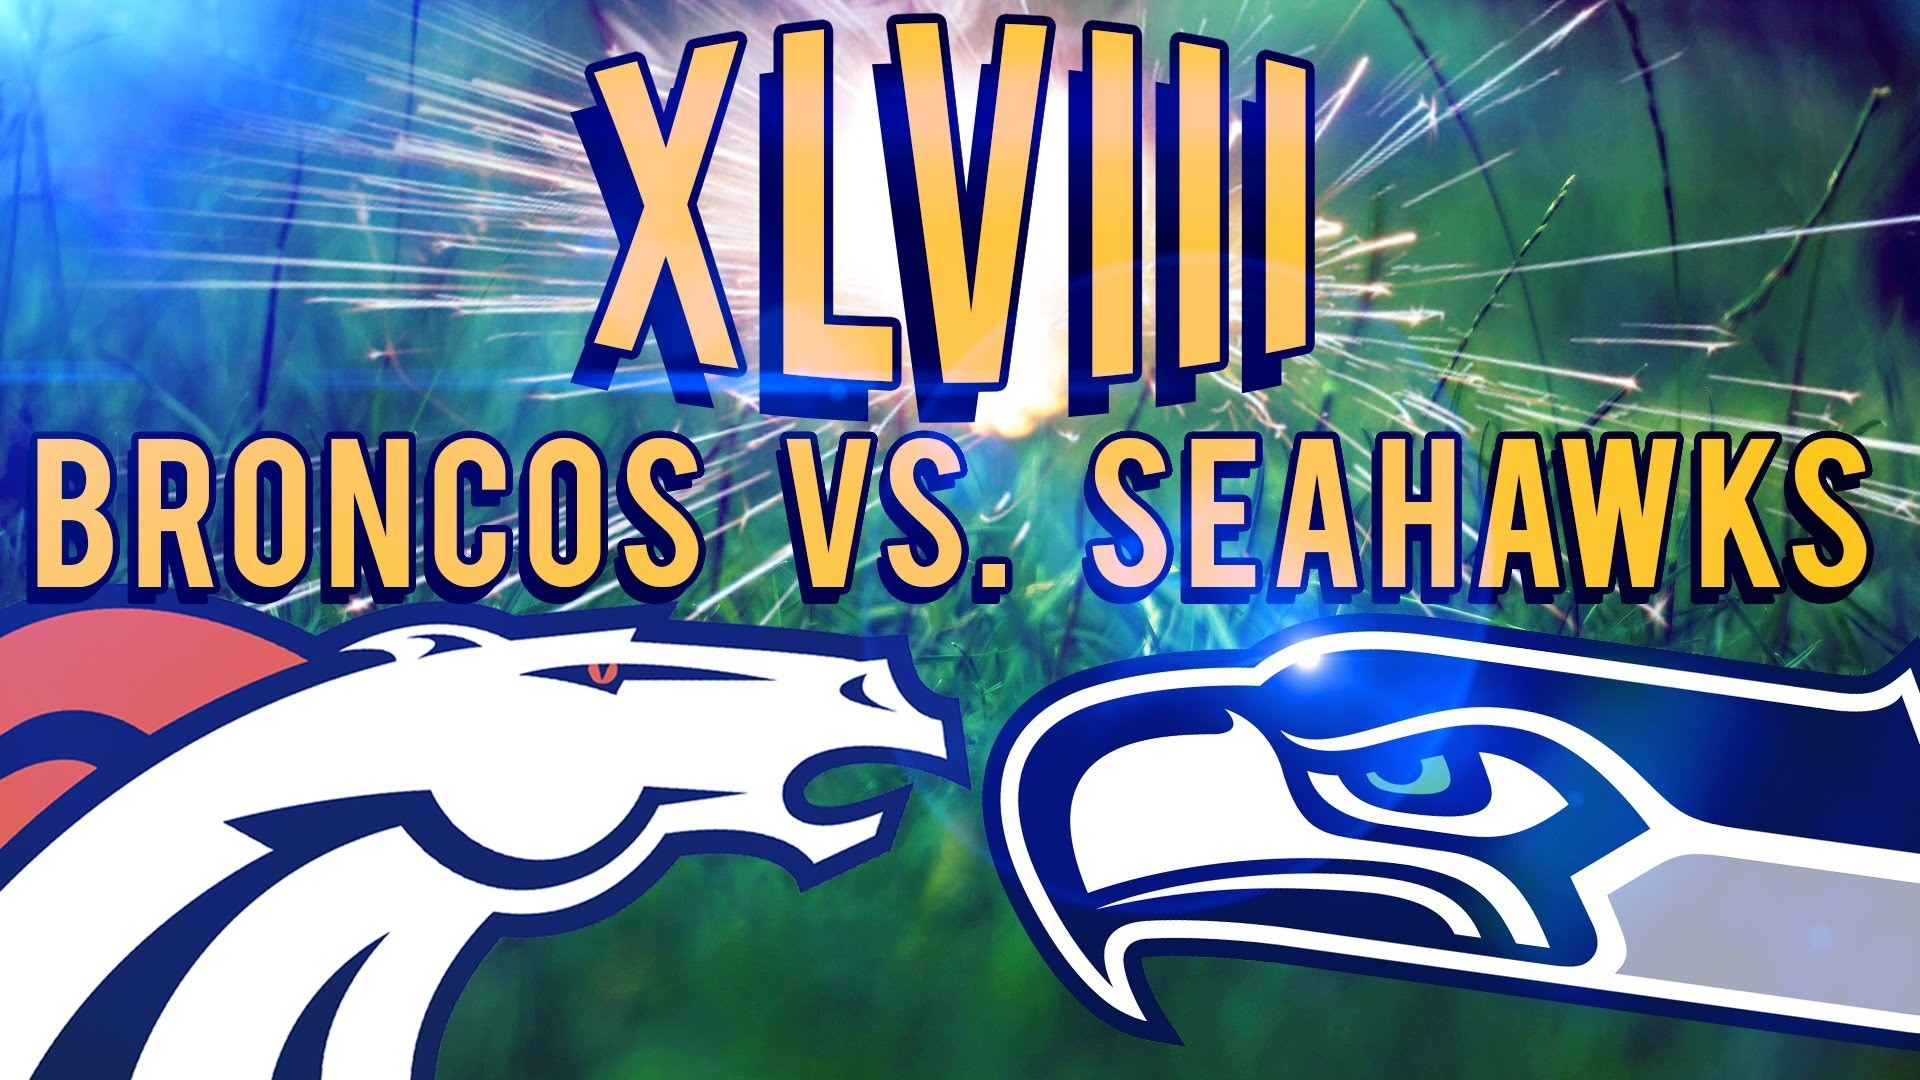 Super Bowl 48 Denver Broncos Vs Seattle Seahawks!